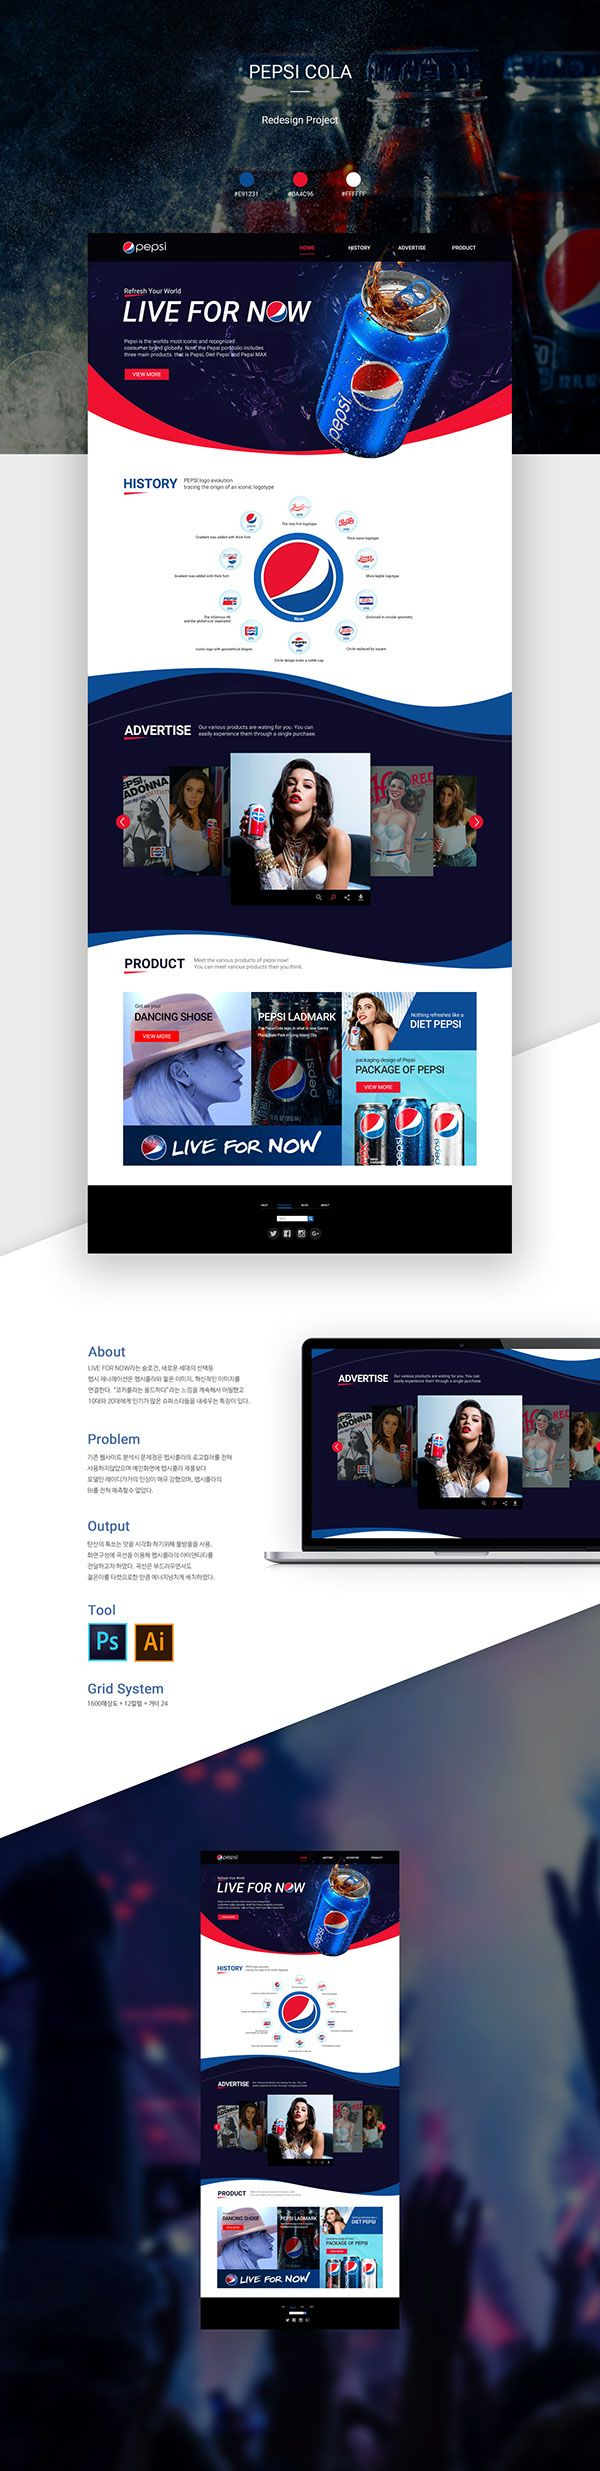 Website redesign project _ pepsi cola